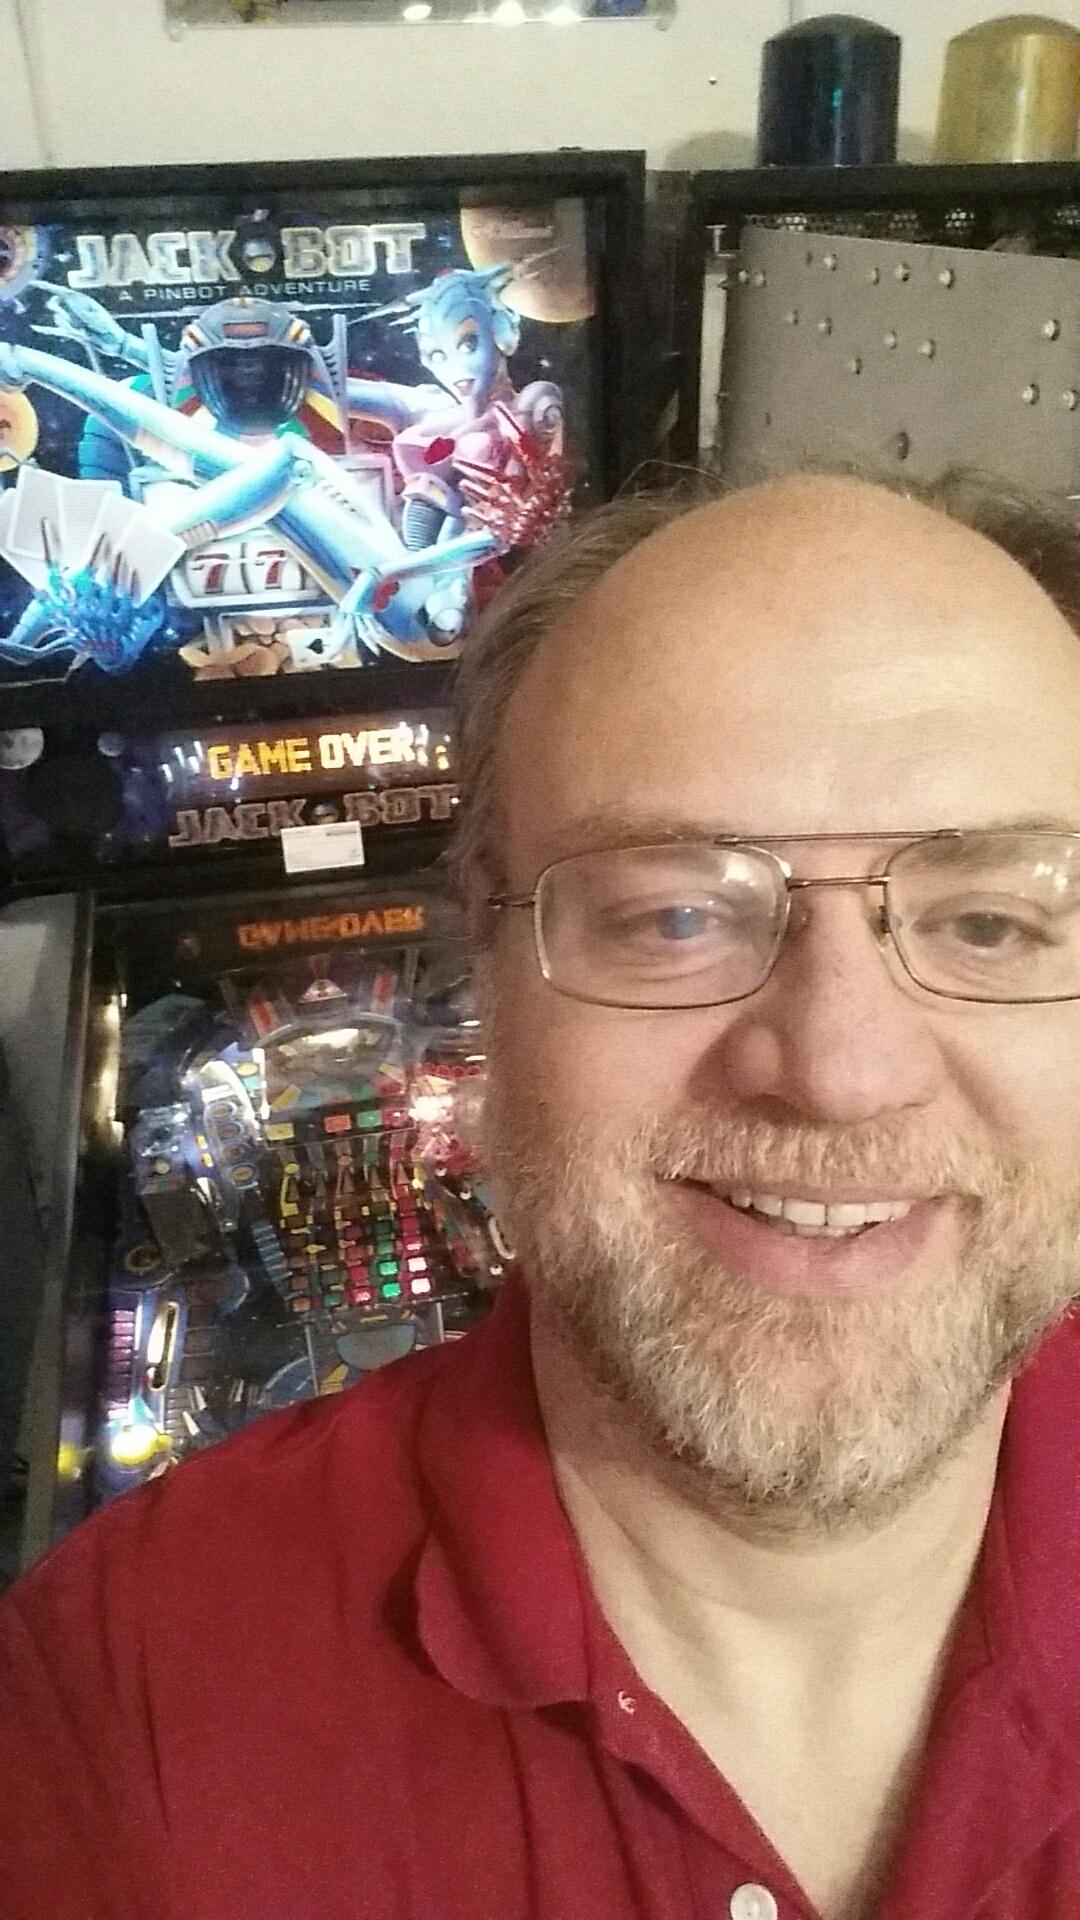 SeanStewart: Jack*Bot: Casino Run (Pinball Bonus Mode) 1,450,000,000 points on 2017-08-11 20:30:00